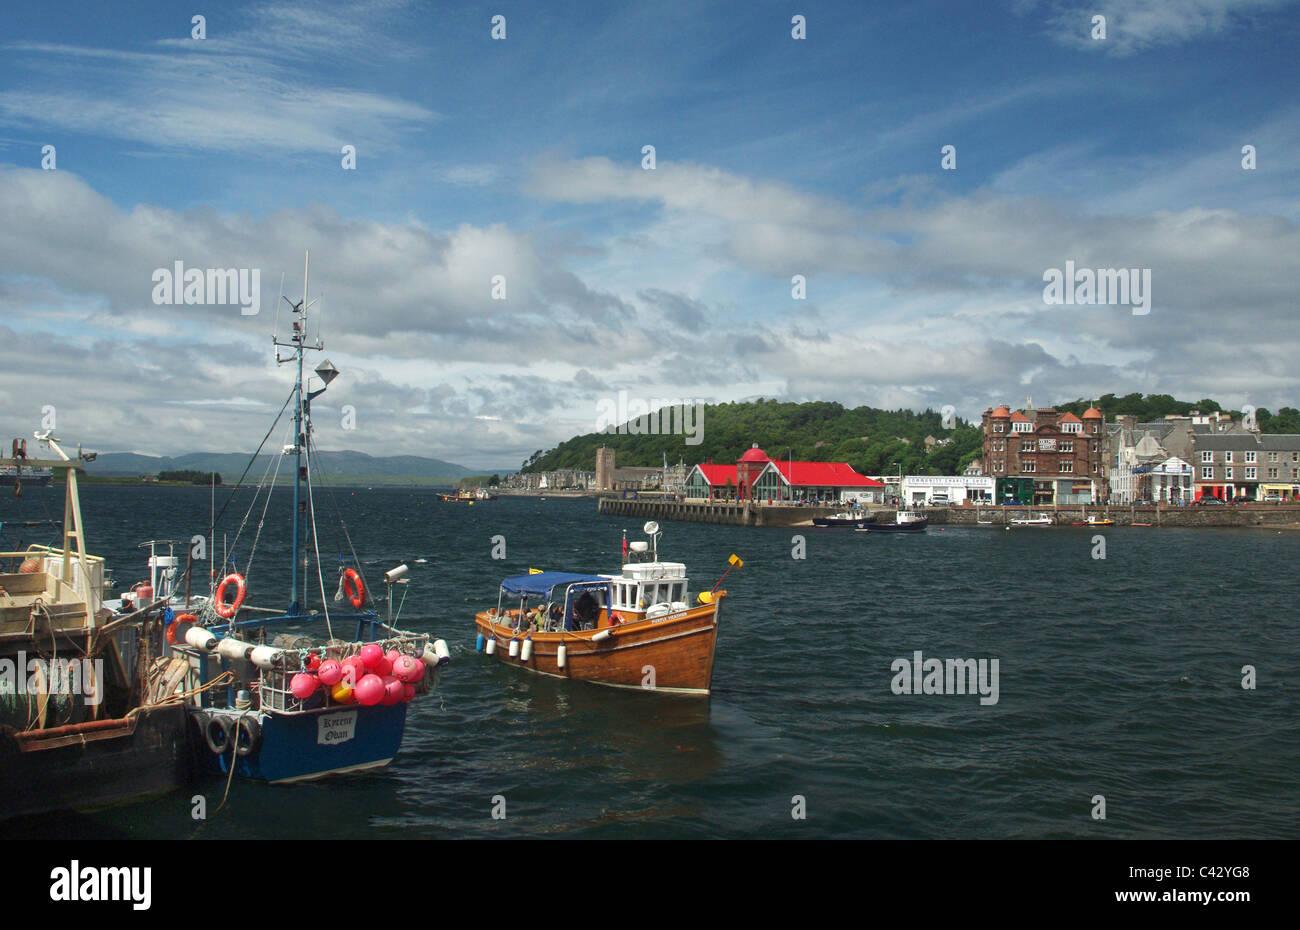 Pleasure boat entering the harbour at Oban, Scotland, UK Stock Photo